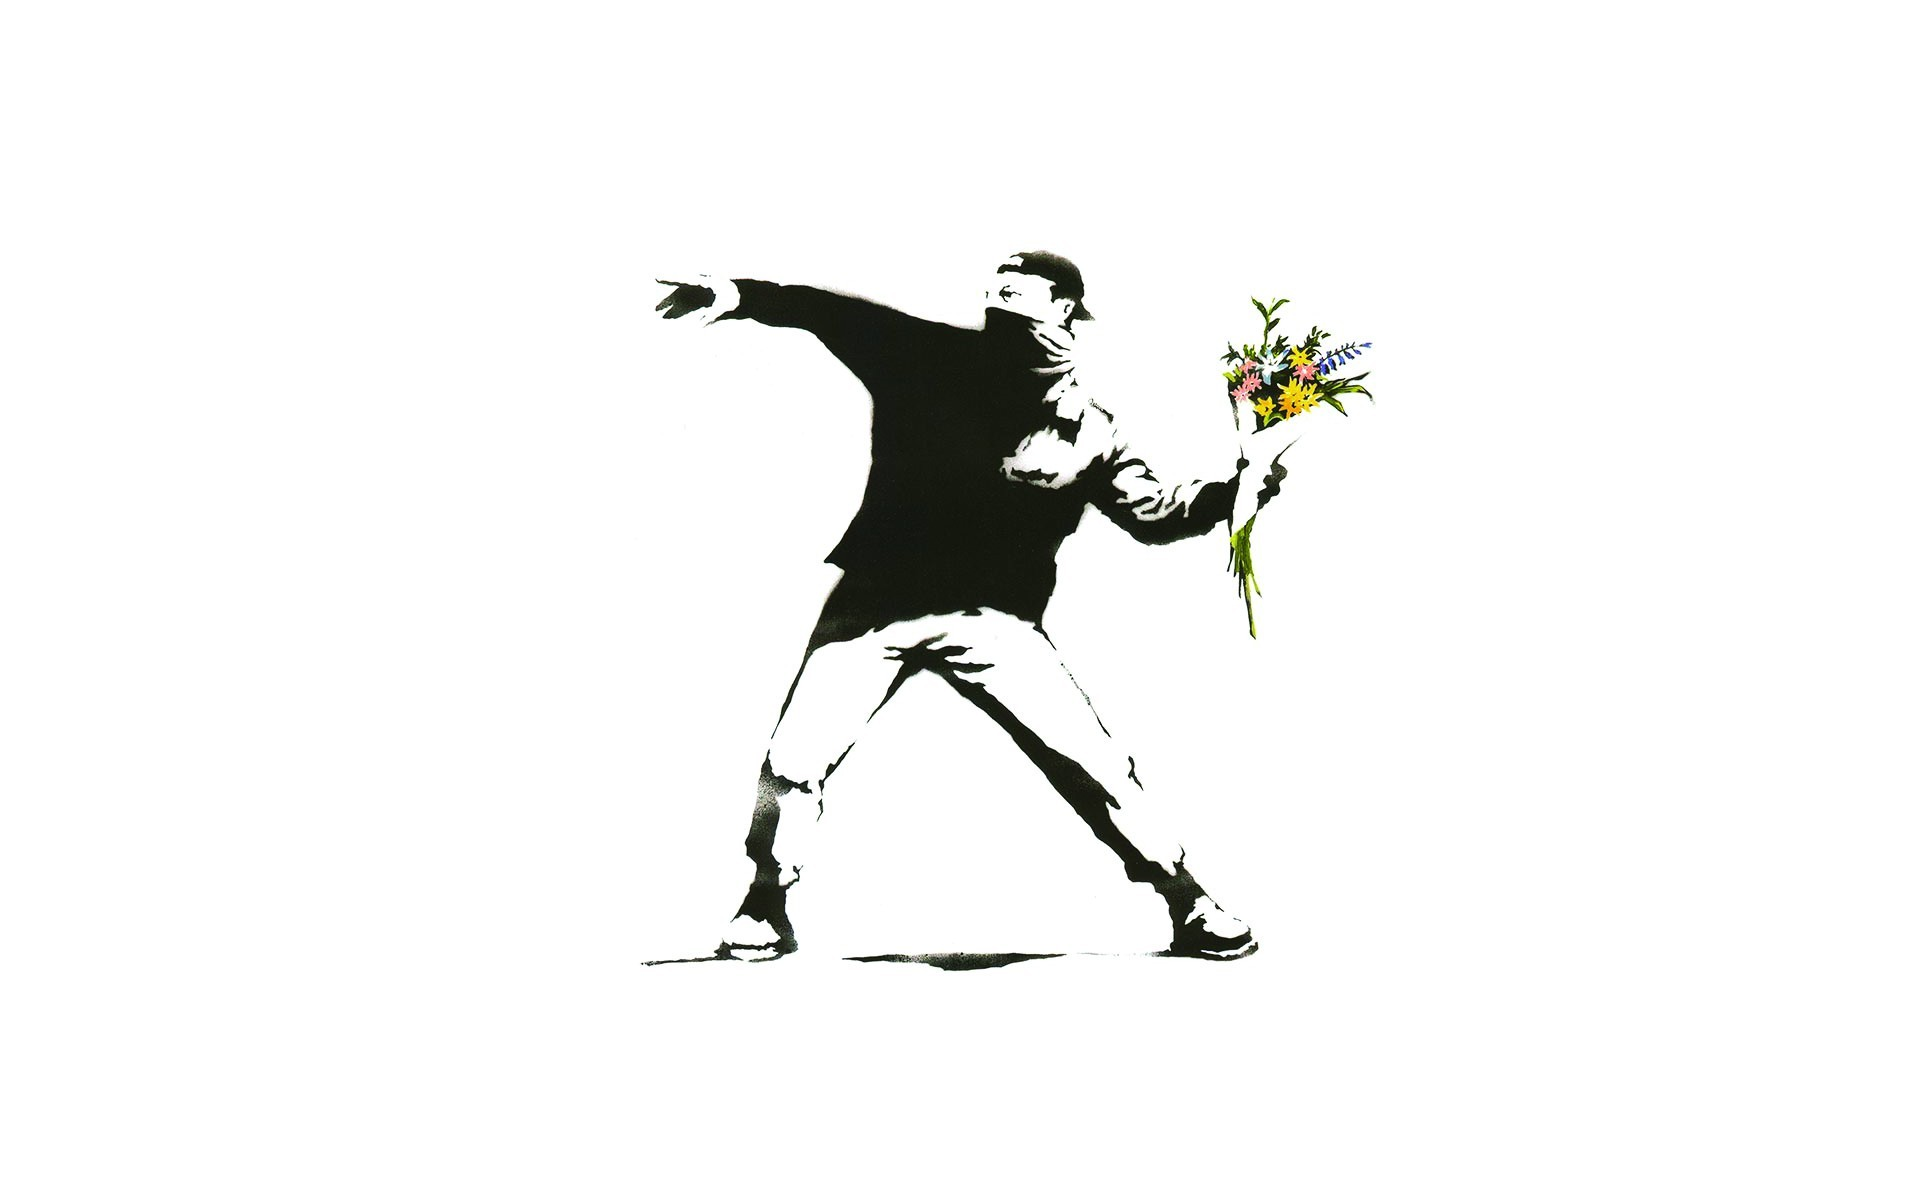 Green Animal Print Wallpaper Minimalism White Background Banksy Graffiti Men